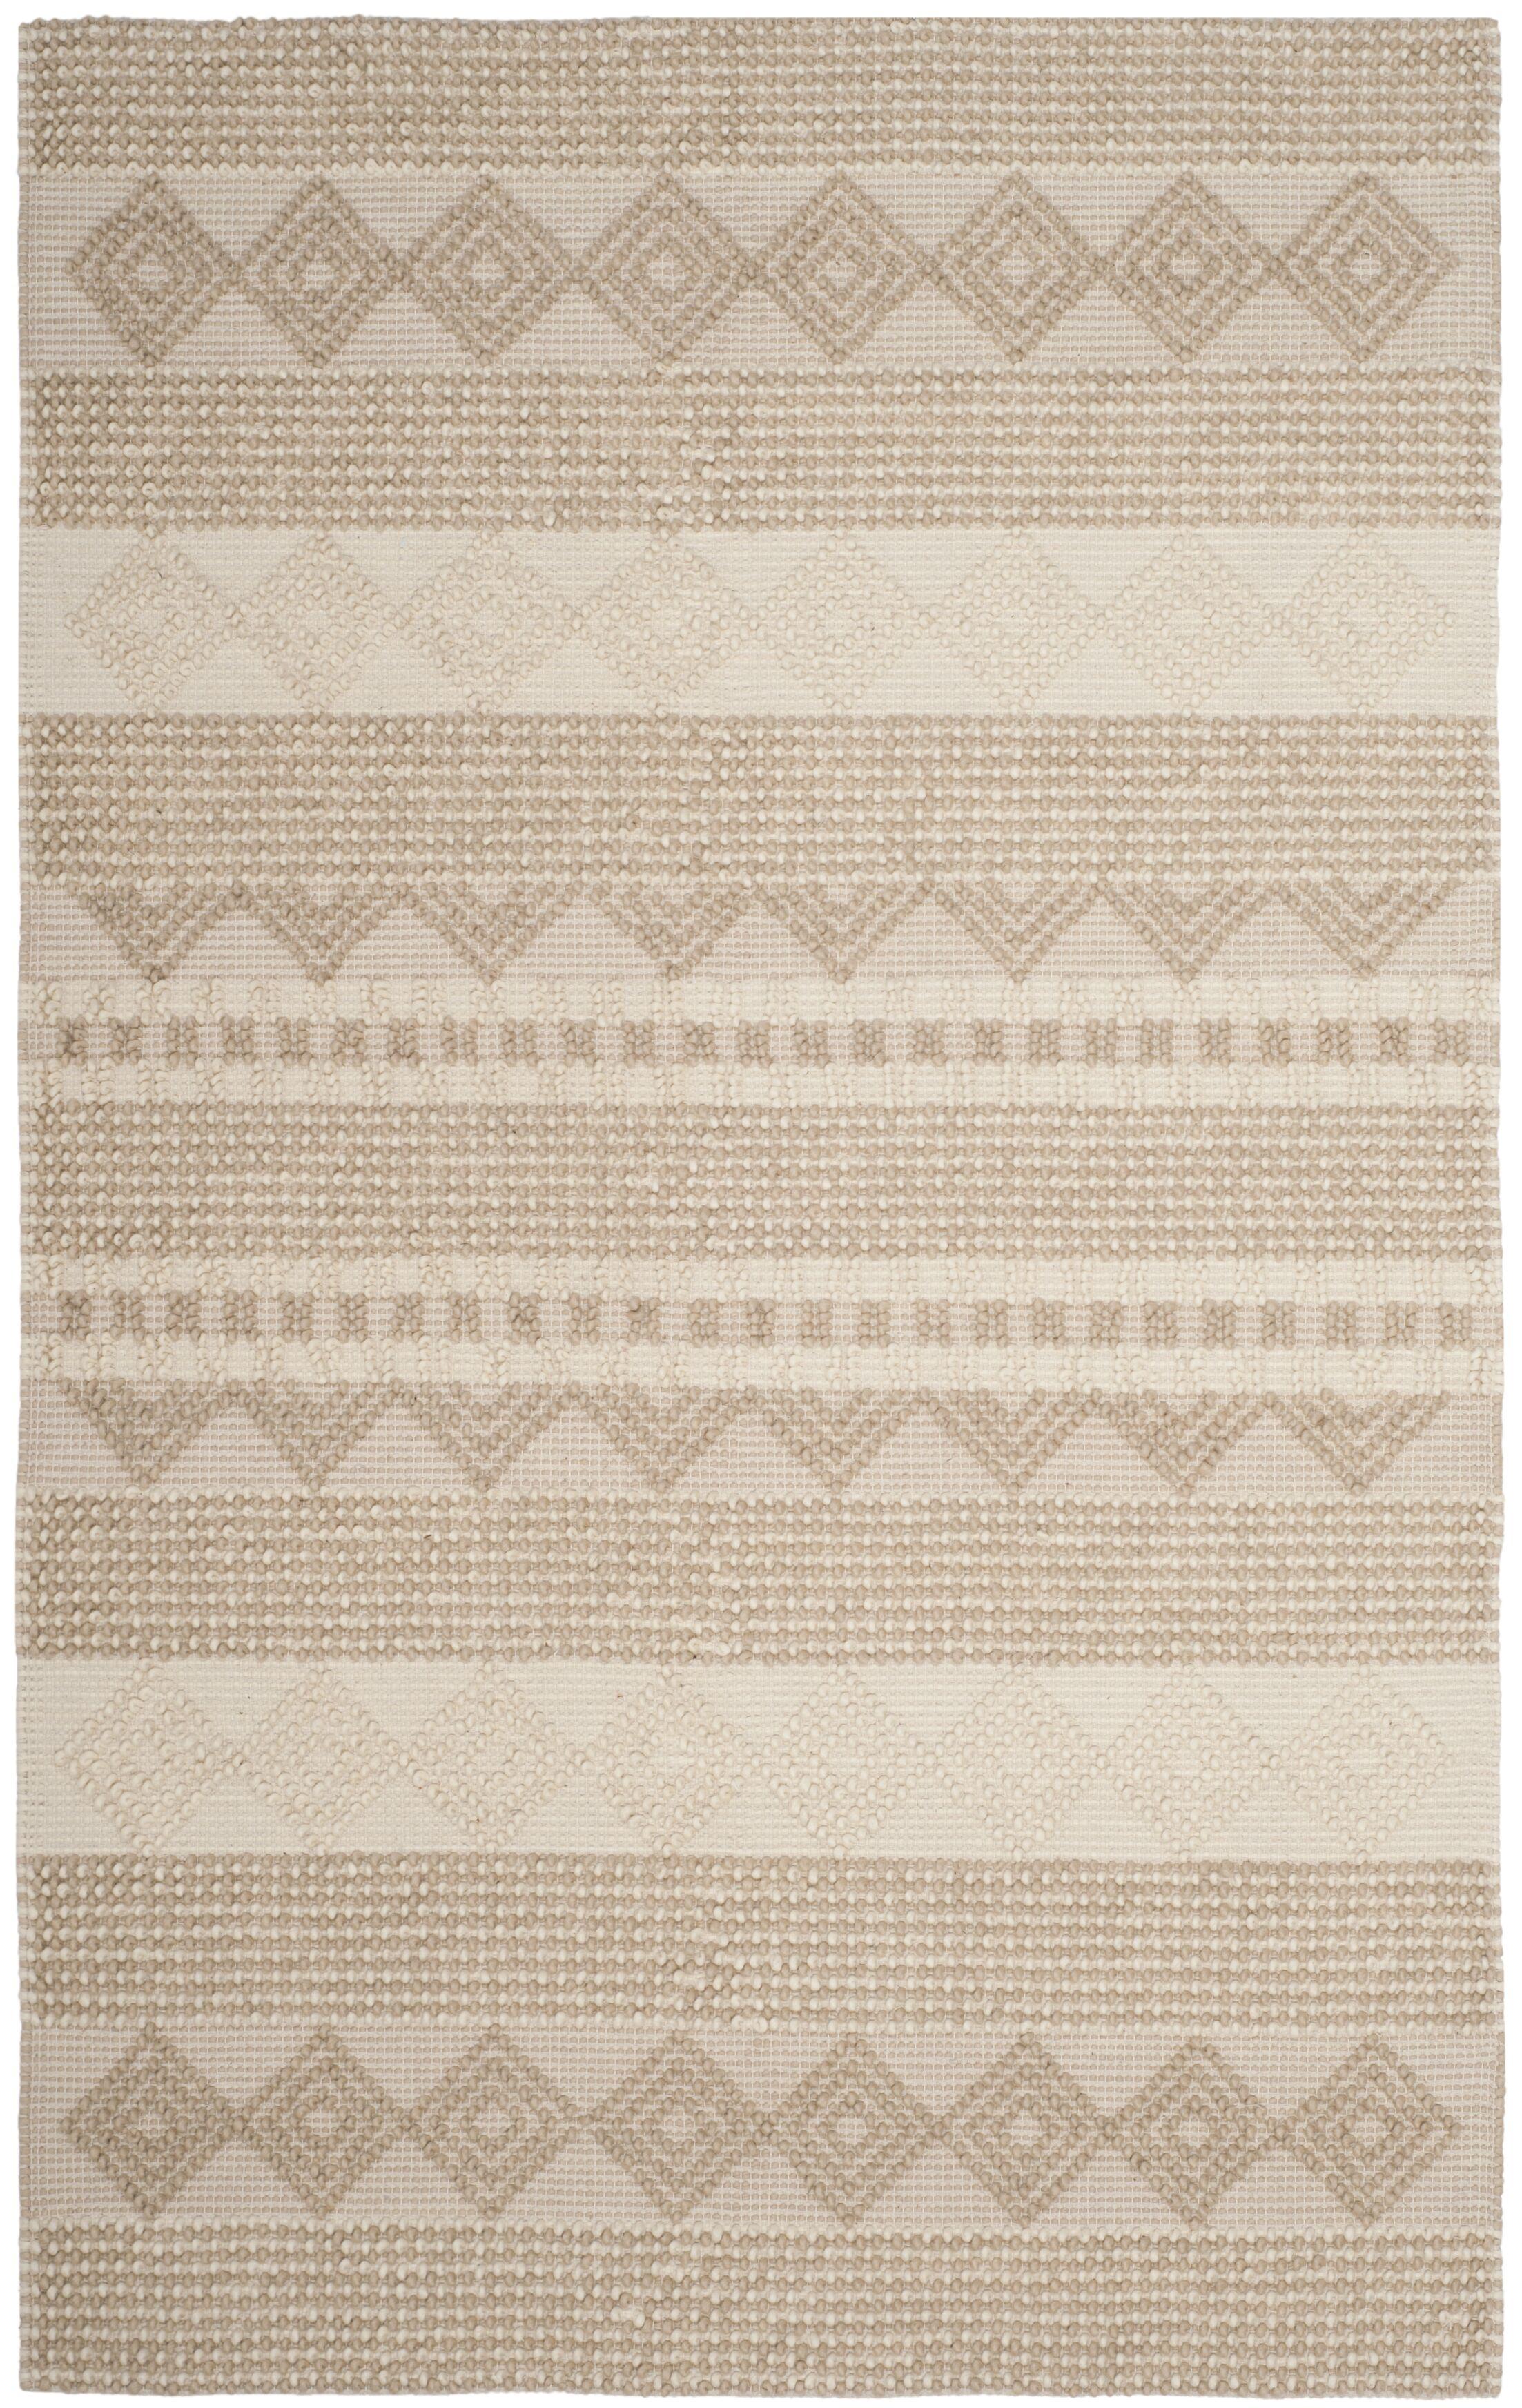 Billie Hand-Tufted Beige/Ivory Area Rug Rug Size: Rectangle 9' x 12'